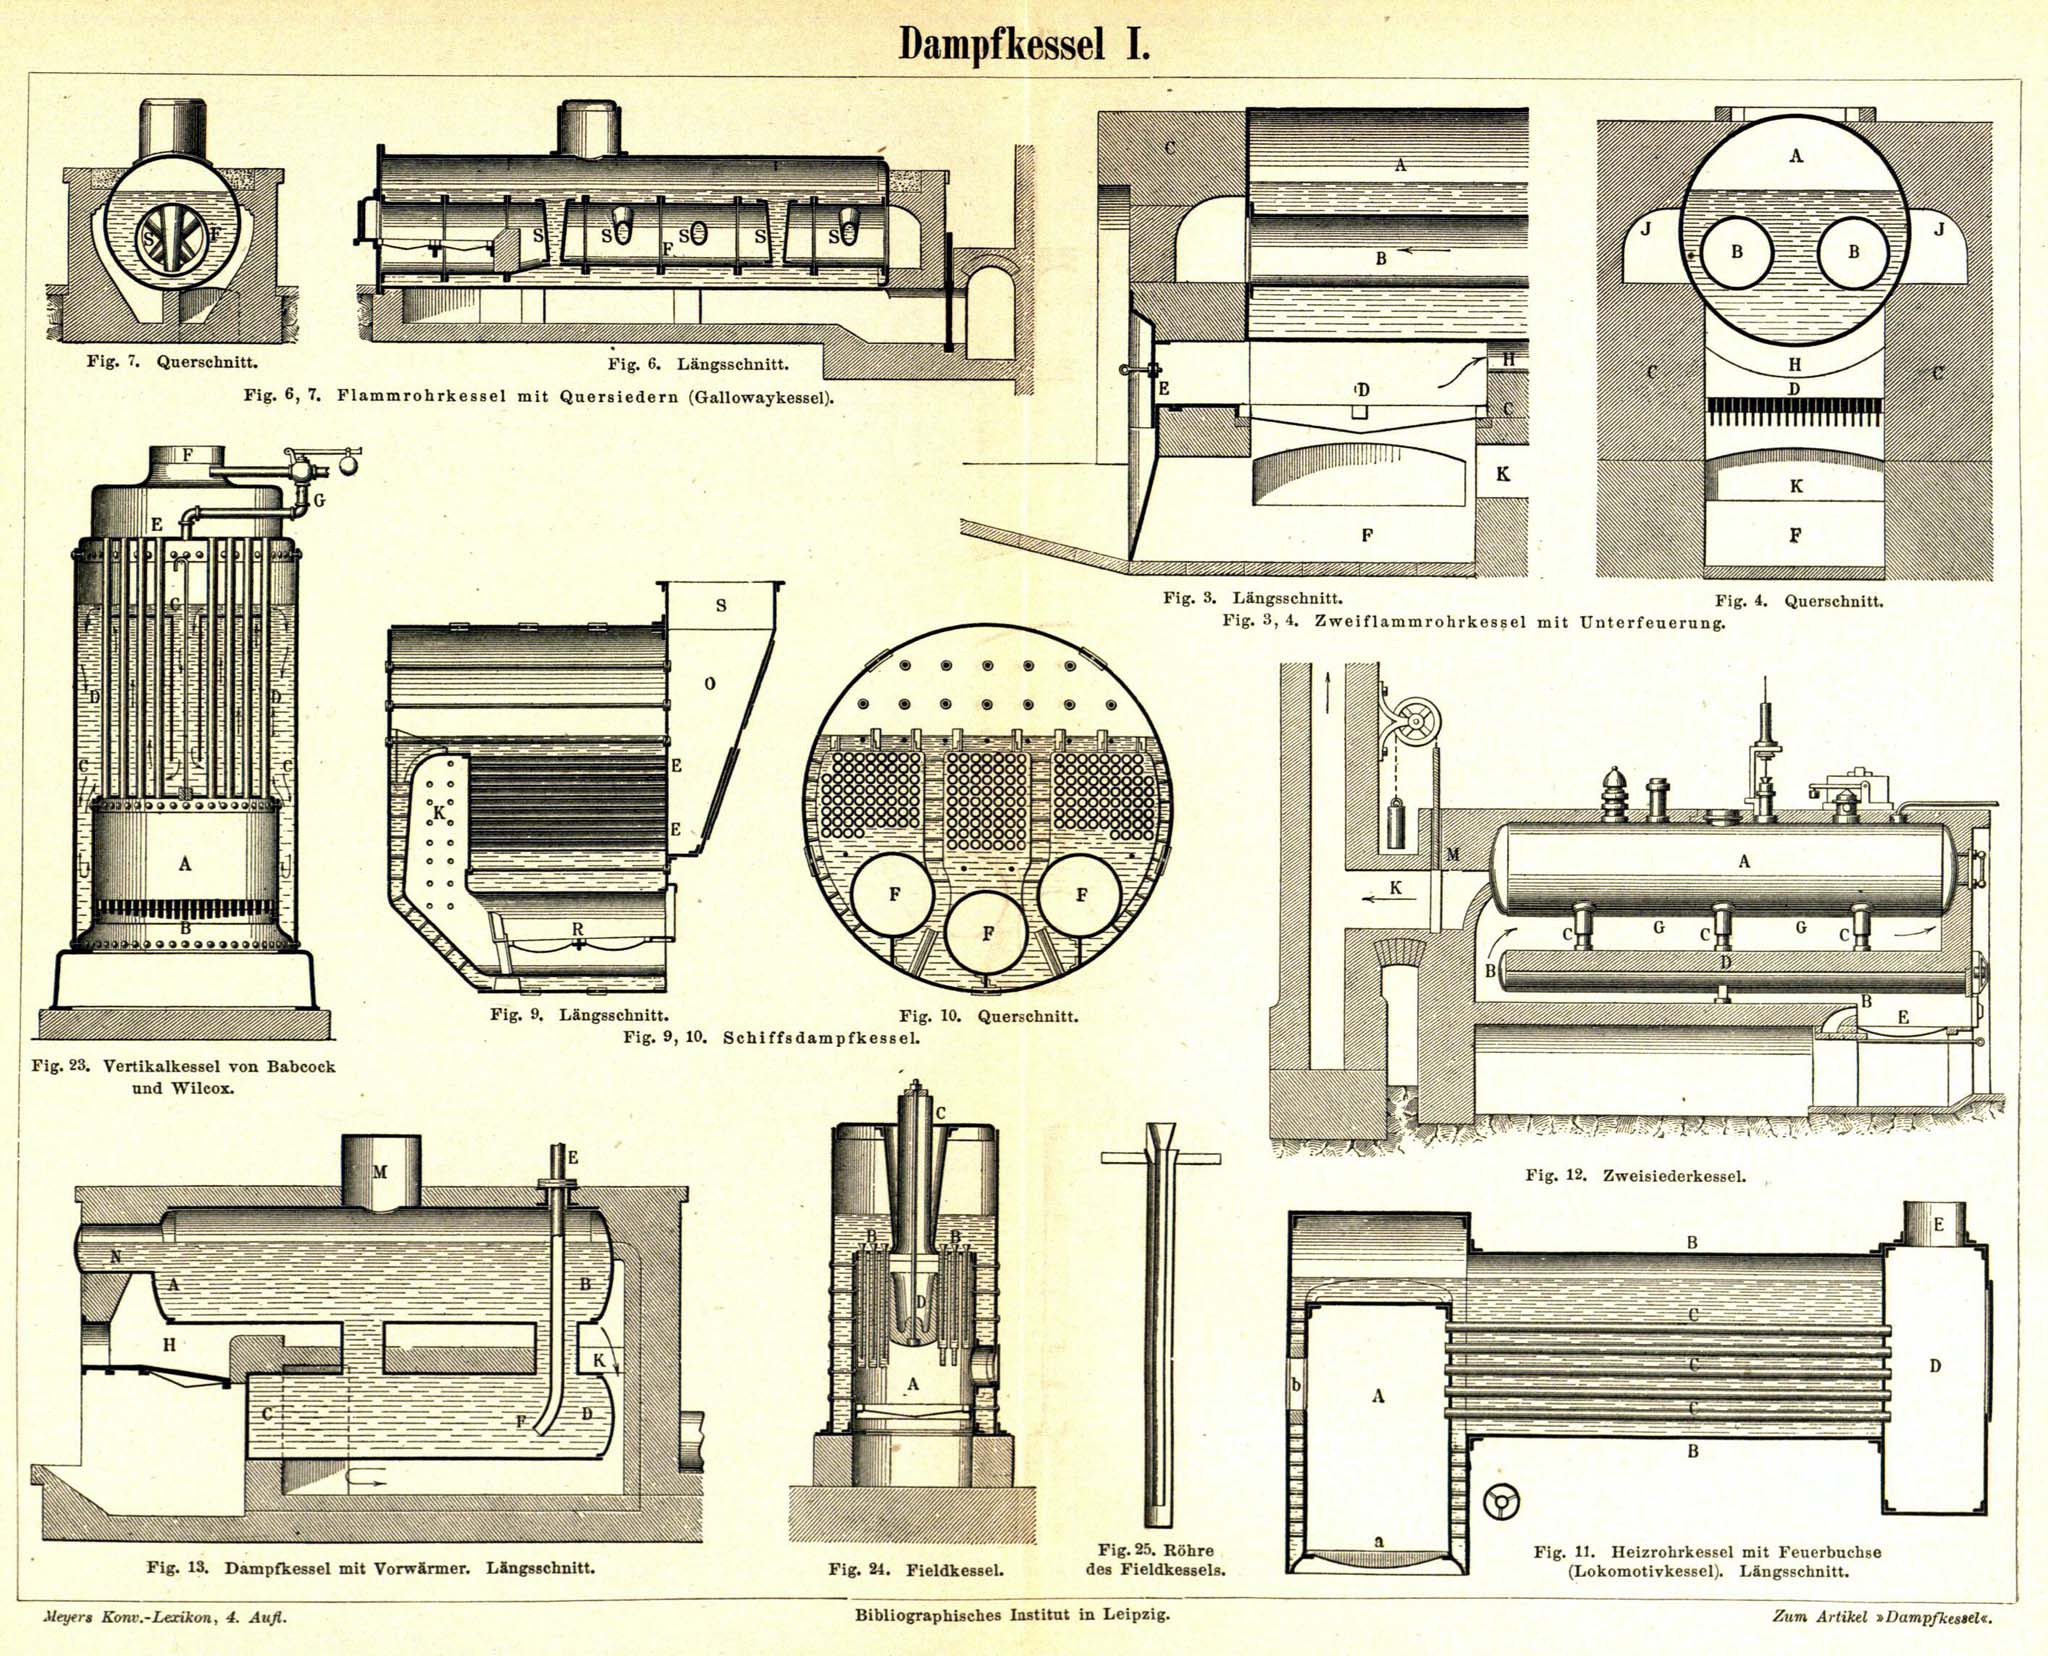 retro|bib - Seite aus Meyers Konversationslexikon: Dampfkessel I